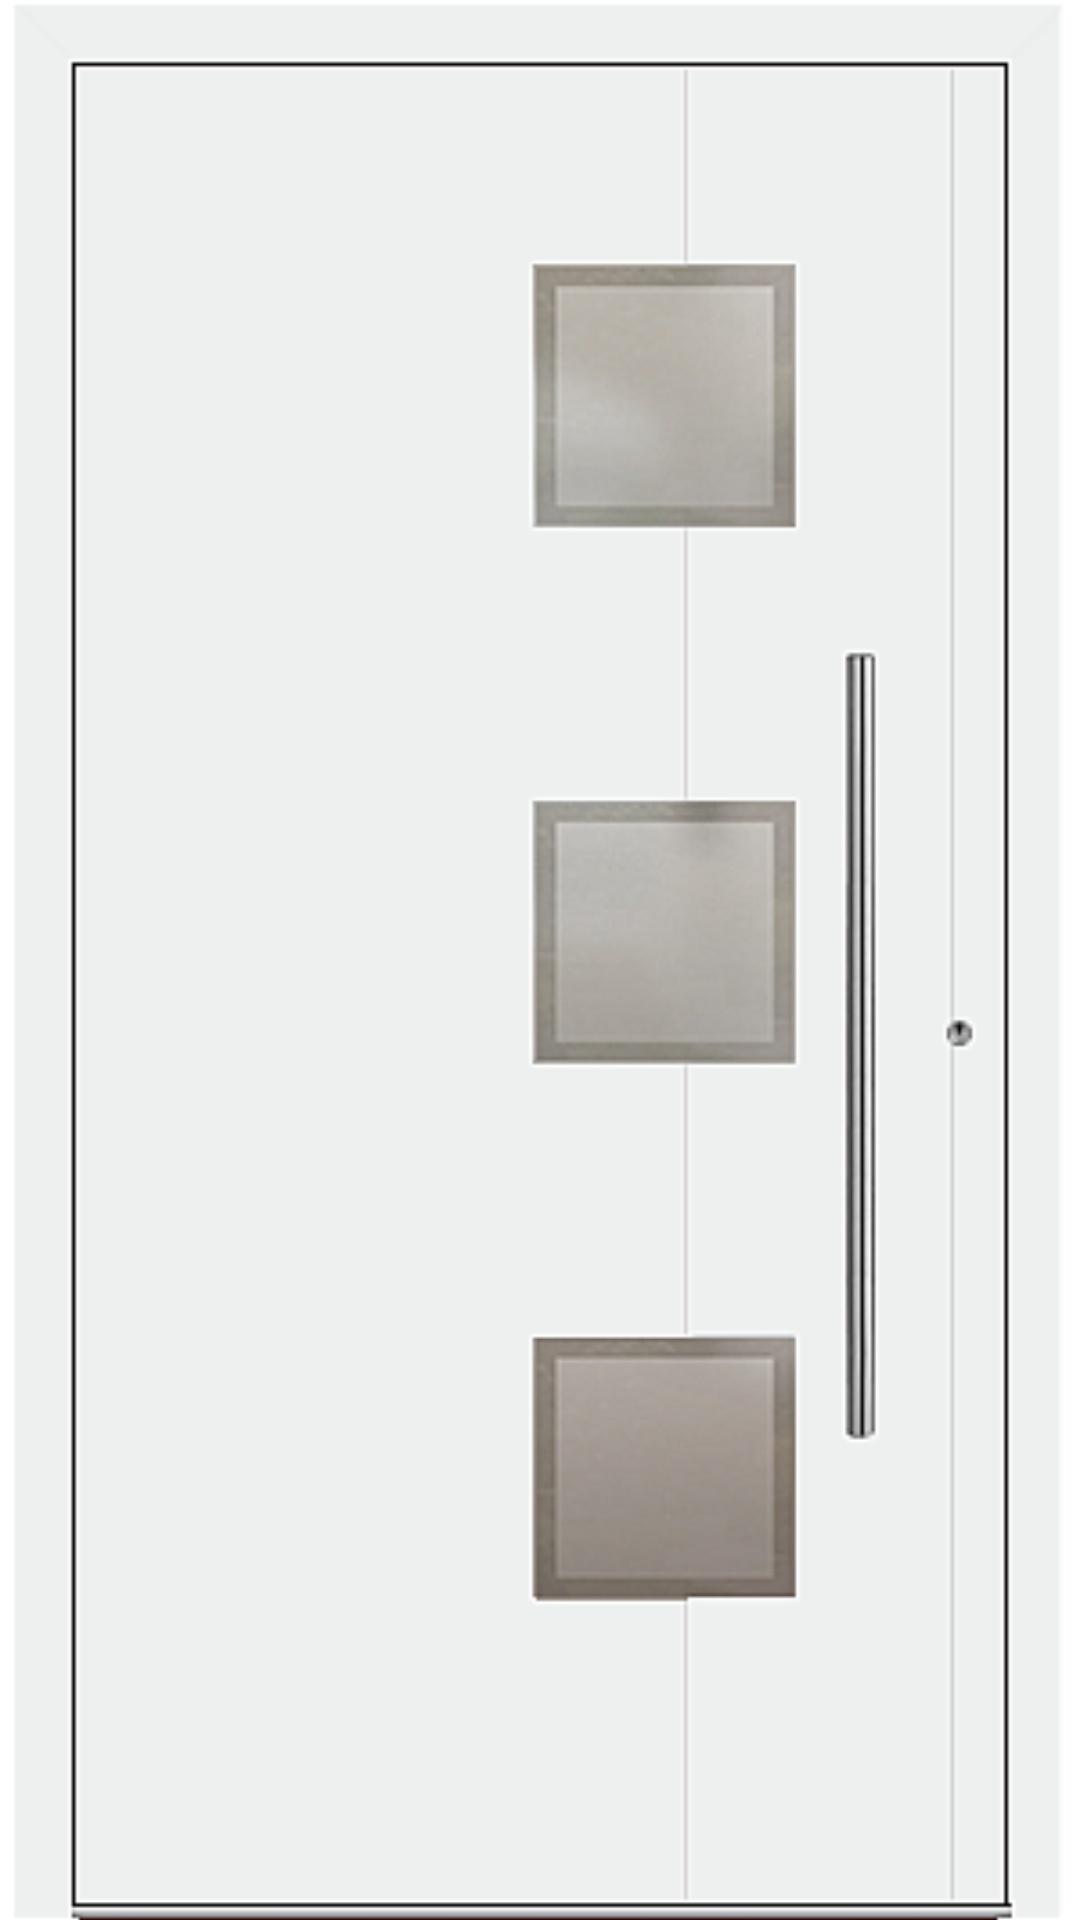 PaXentrée Aluminium Haustür M04350 weiß